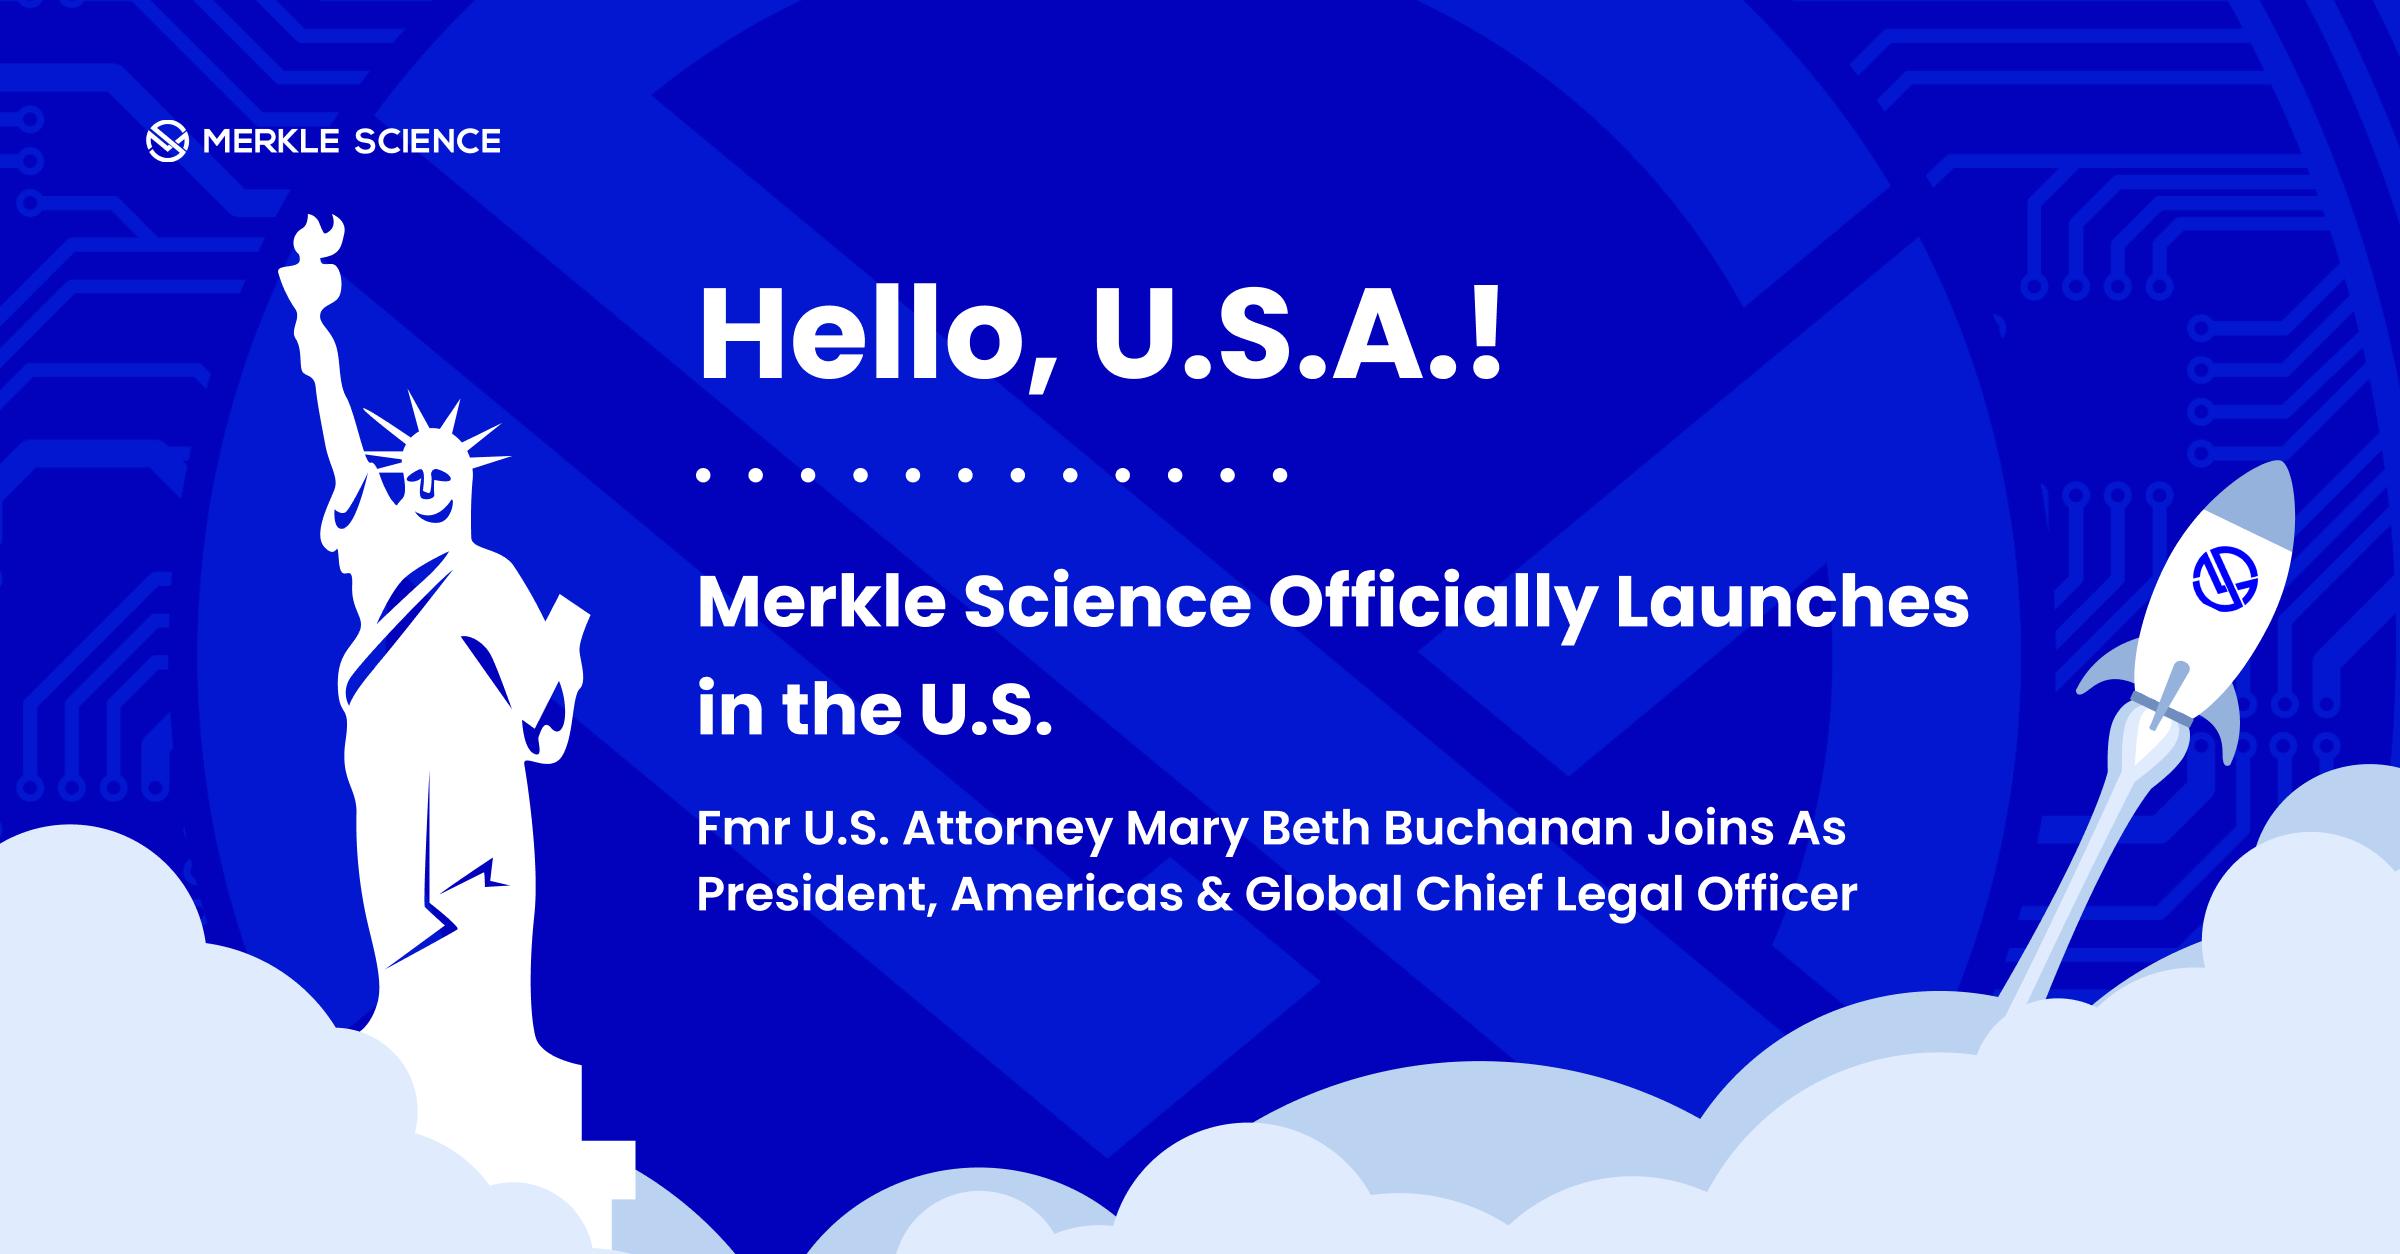 Merkle Science Taps Former U.S. Attorney Mary Beth Buchanan as President, Americas & Global Chief Legal Officer